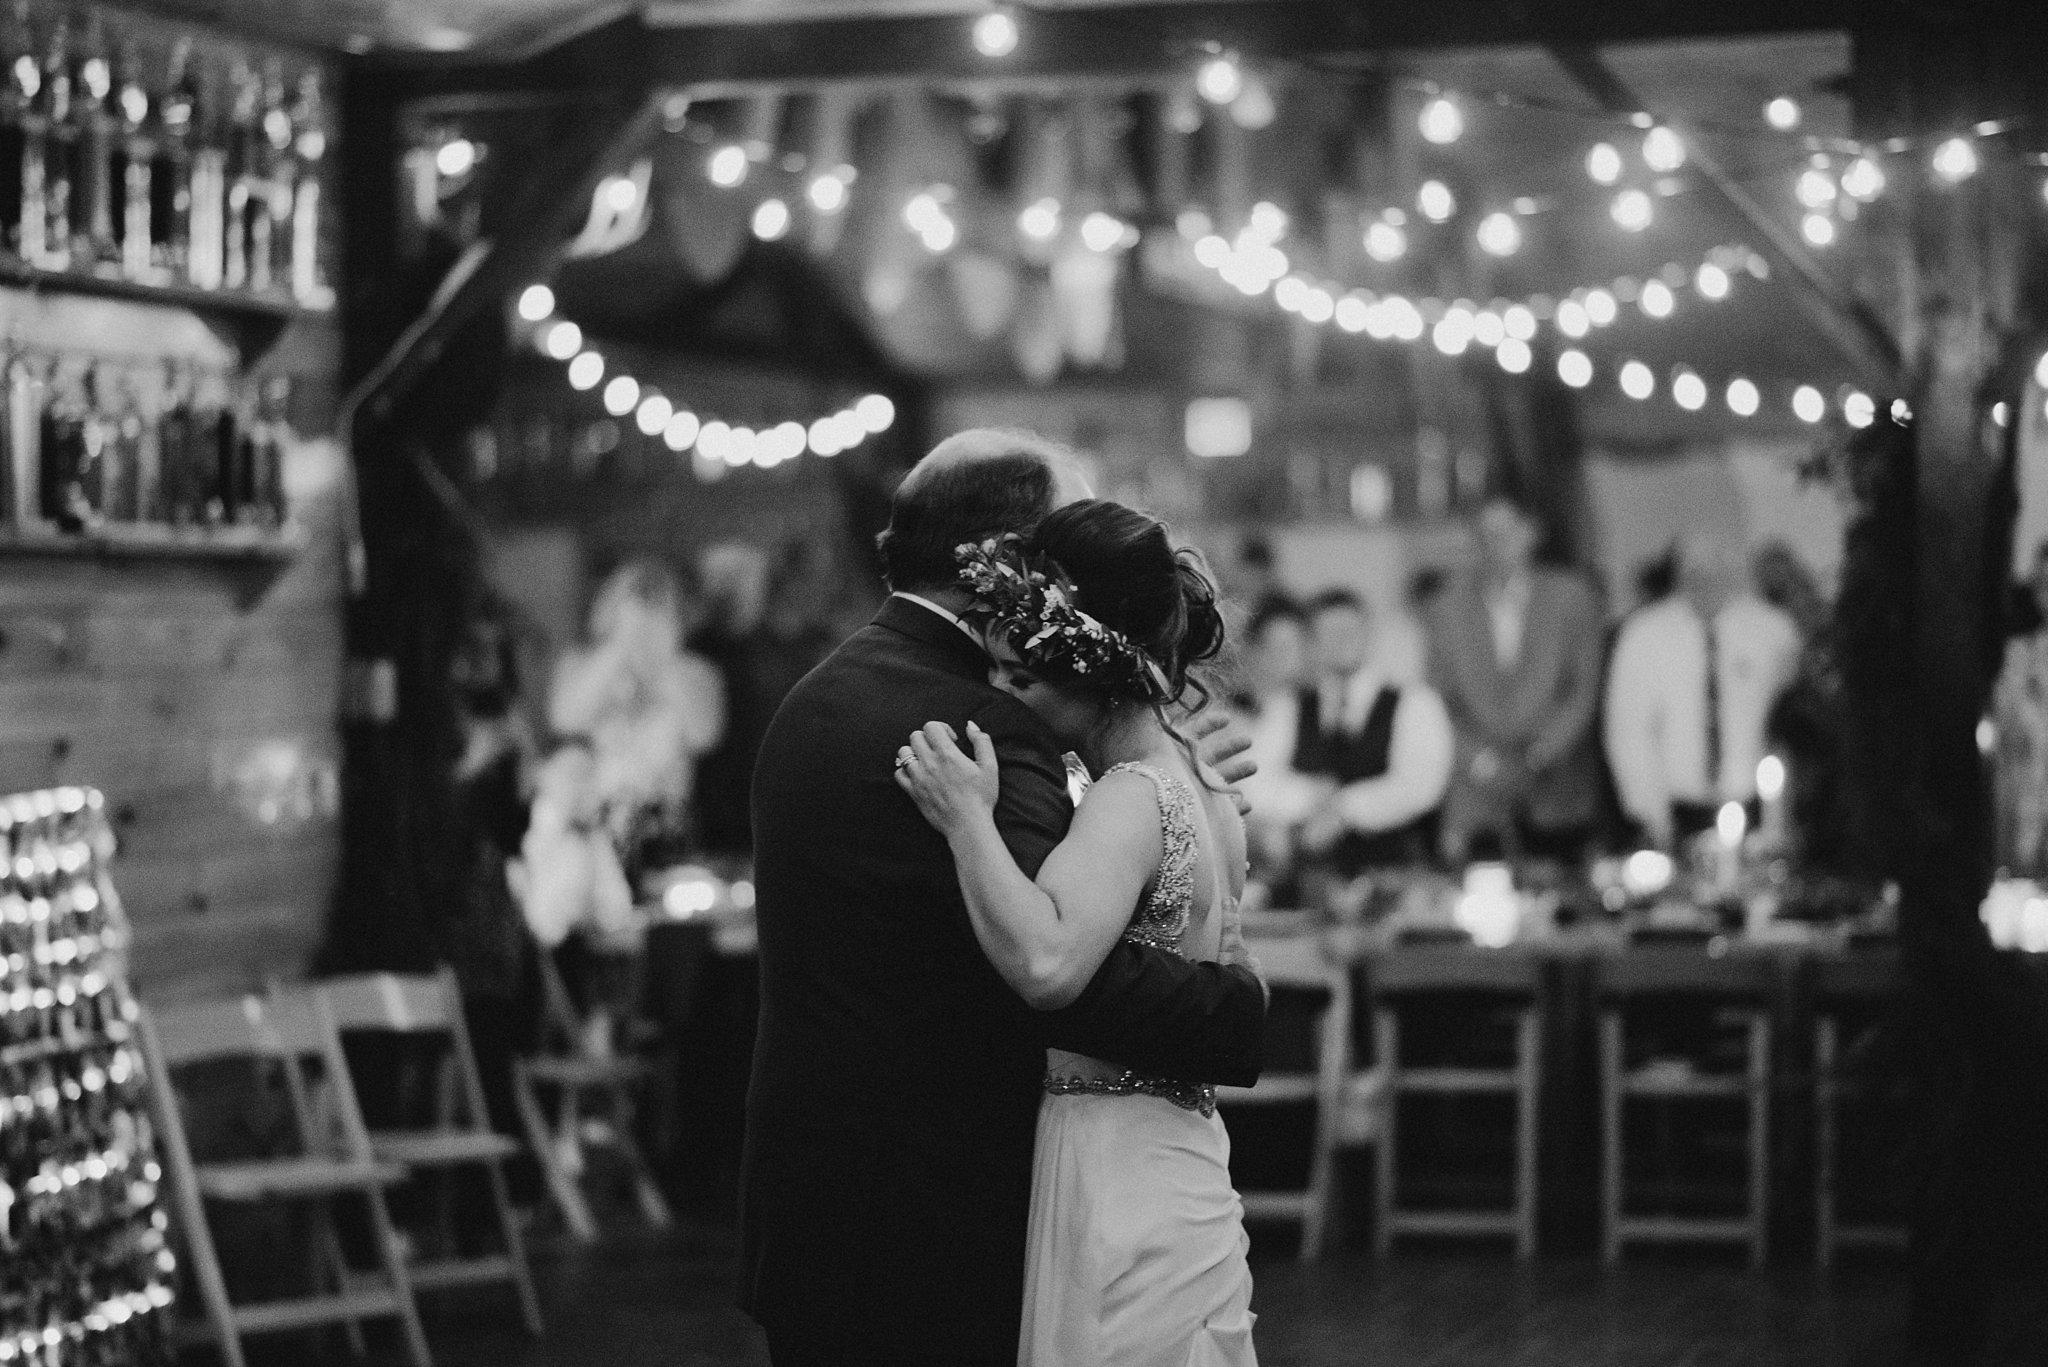 kaihla_tonai_intimate_wedding_elopement_photographer_6671.jpg